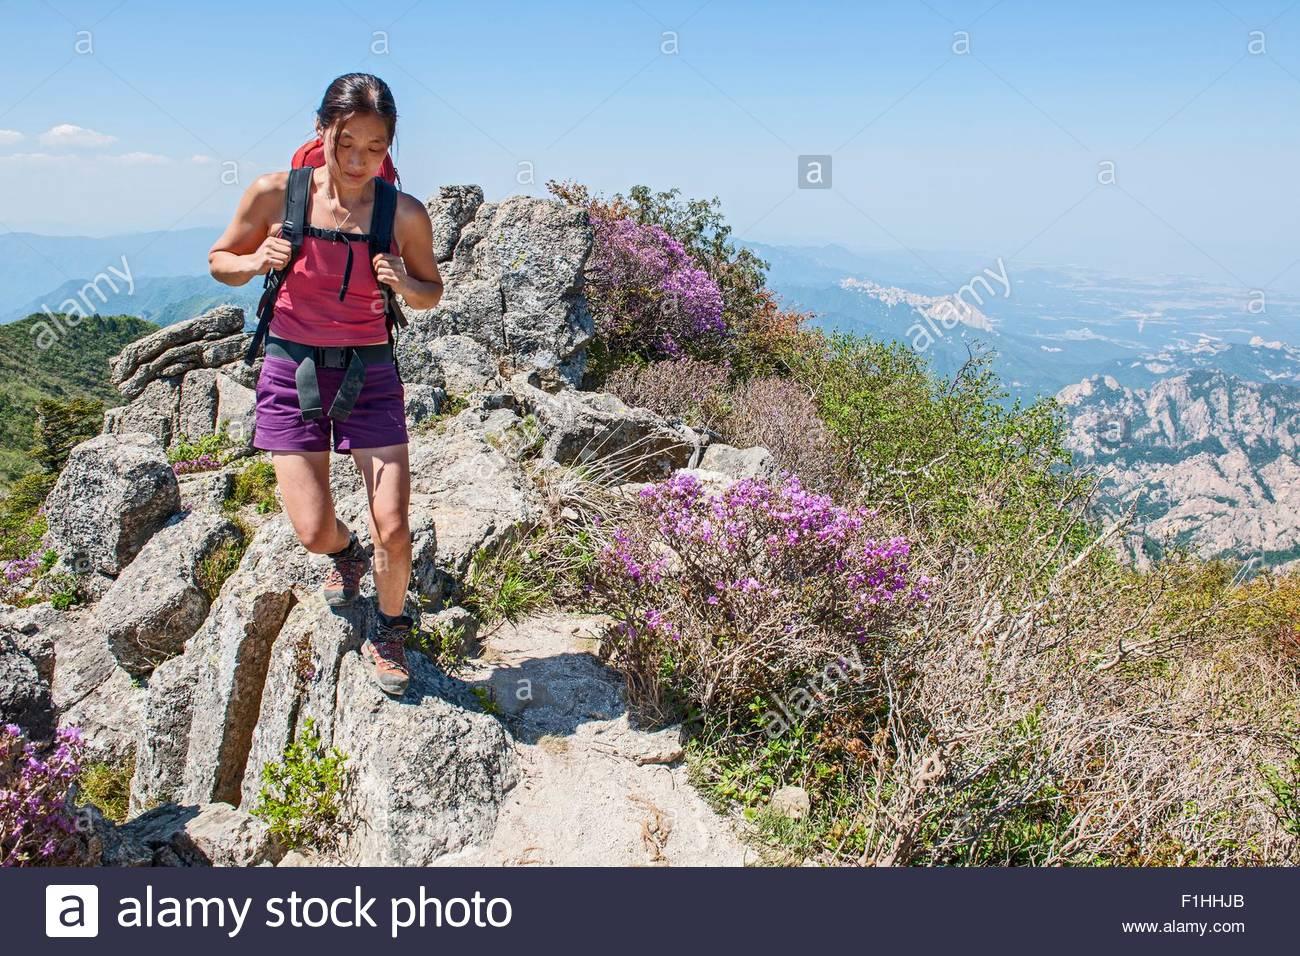 Female hiker walking ridge on way to Daecheongbong peak,  Seoraksan National Park in South Korea - Stock Image